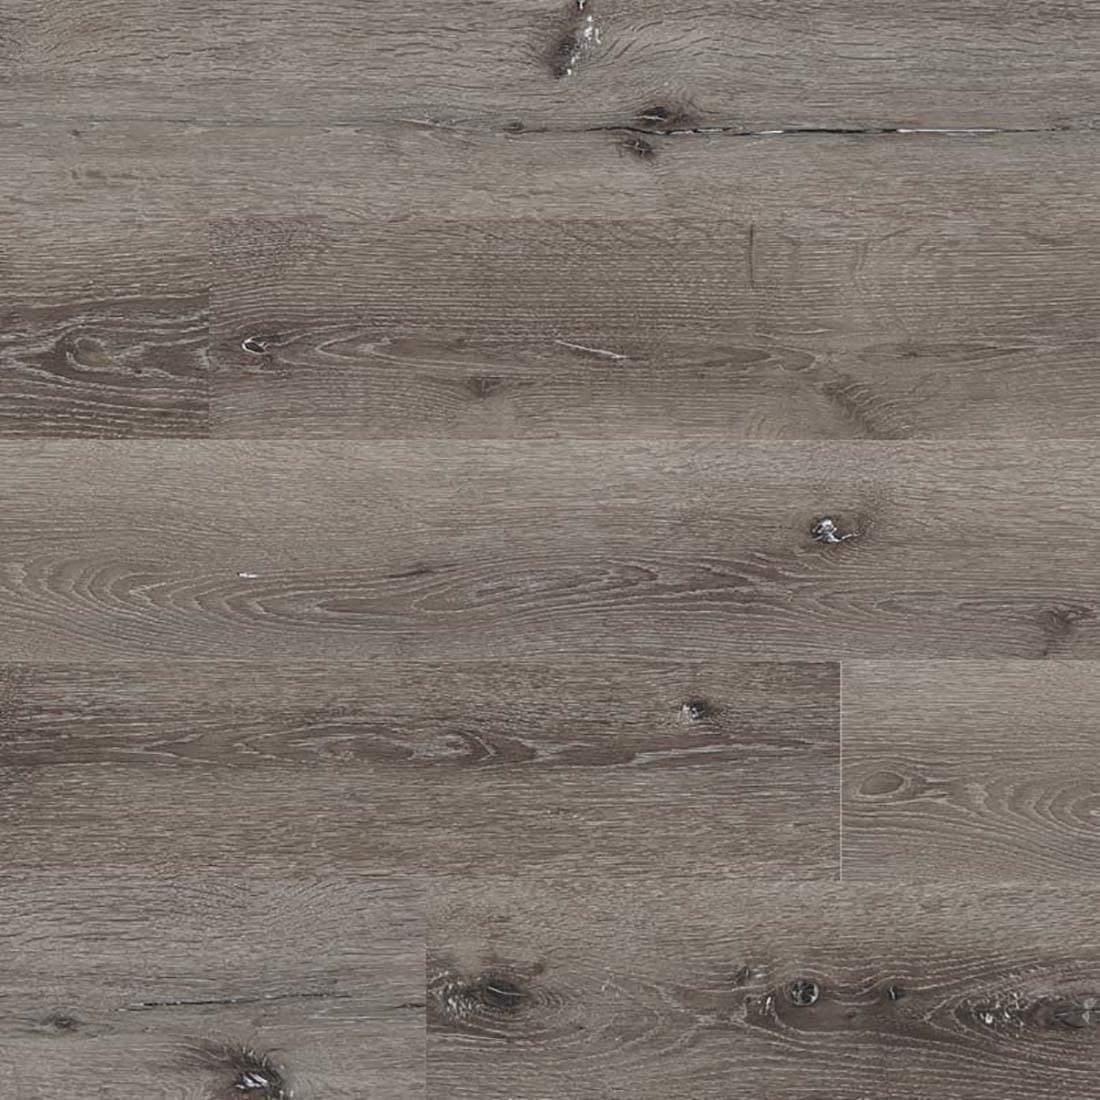 Smokey Maple / 6.5mm / SPC / Click Lock Vinyl Planks - 6.5mm SPC Click Lock - Lakeshore Collection 0